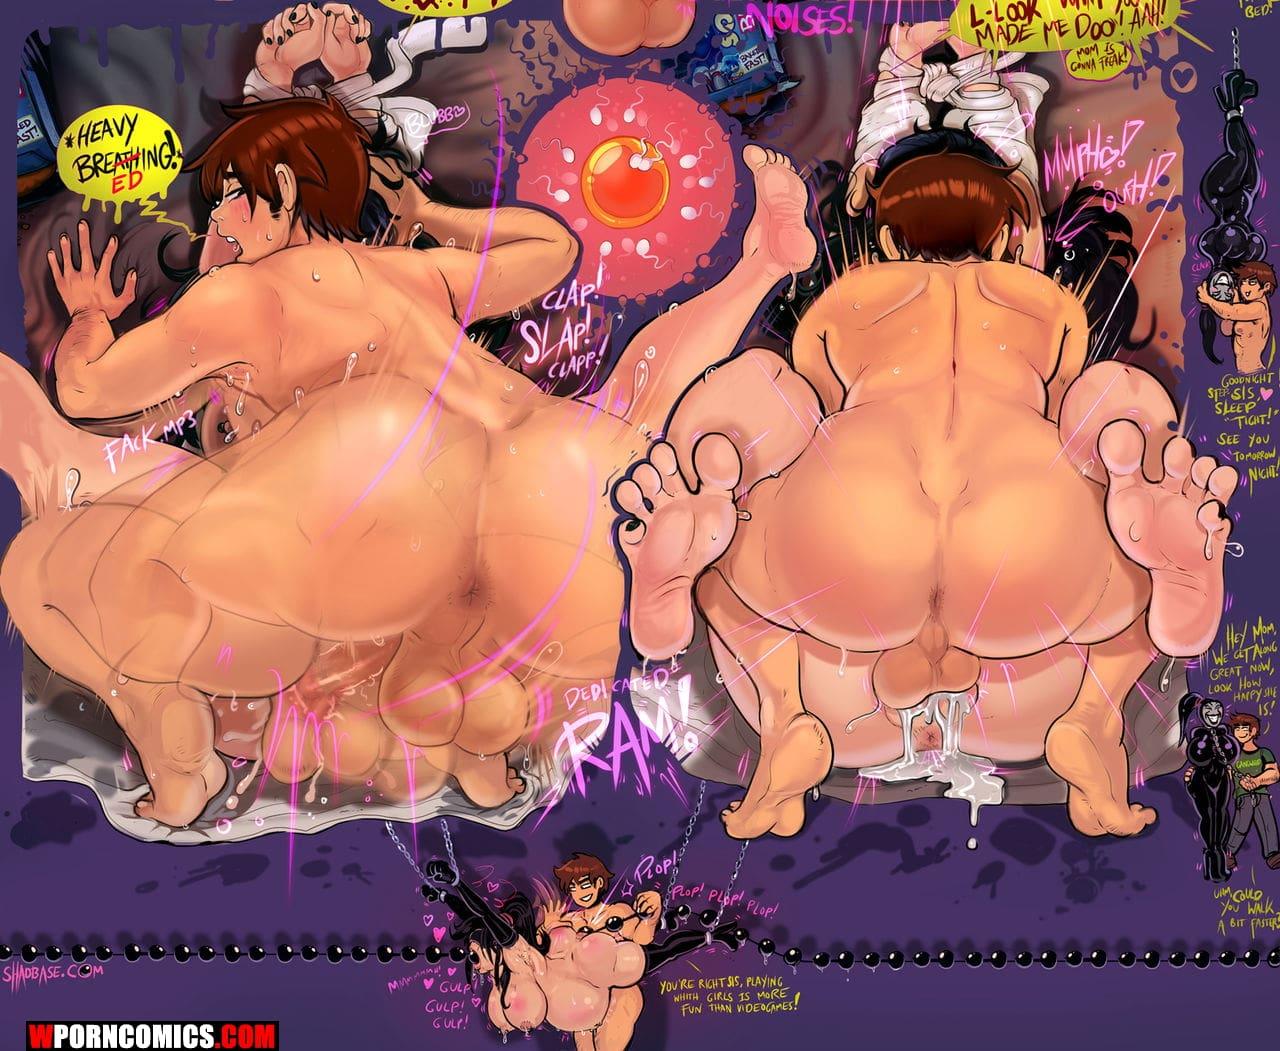 porn-comic-step-siblings-2020-03-03/porn-comic-step-siblings-2020-03-03-46324.jpg